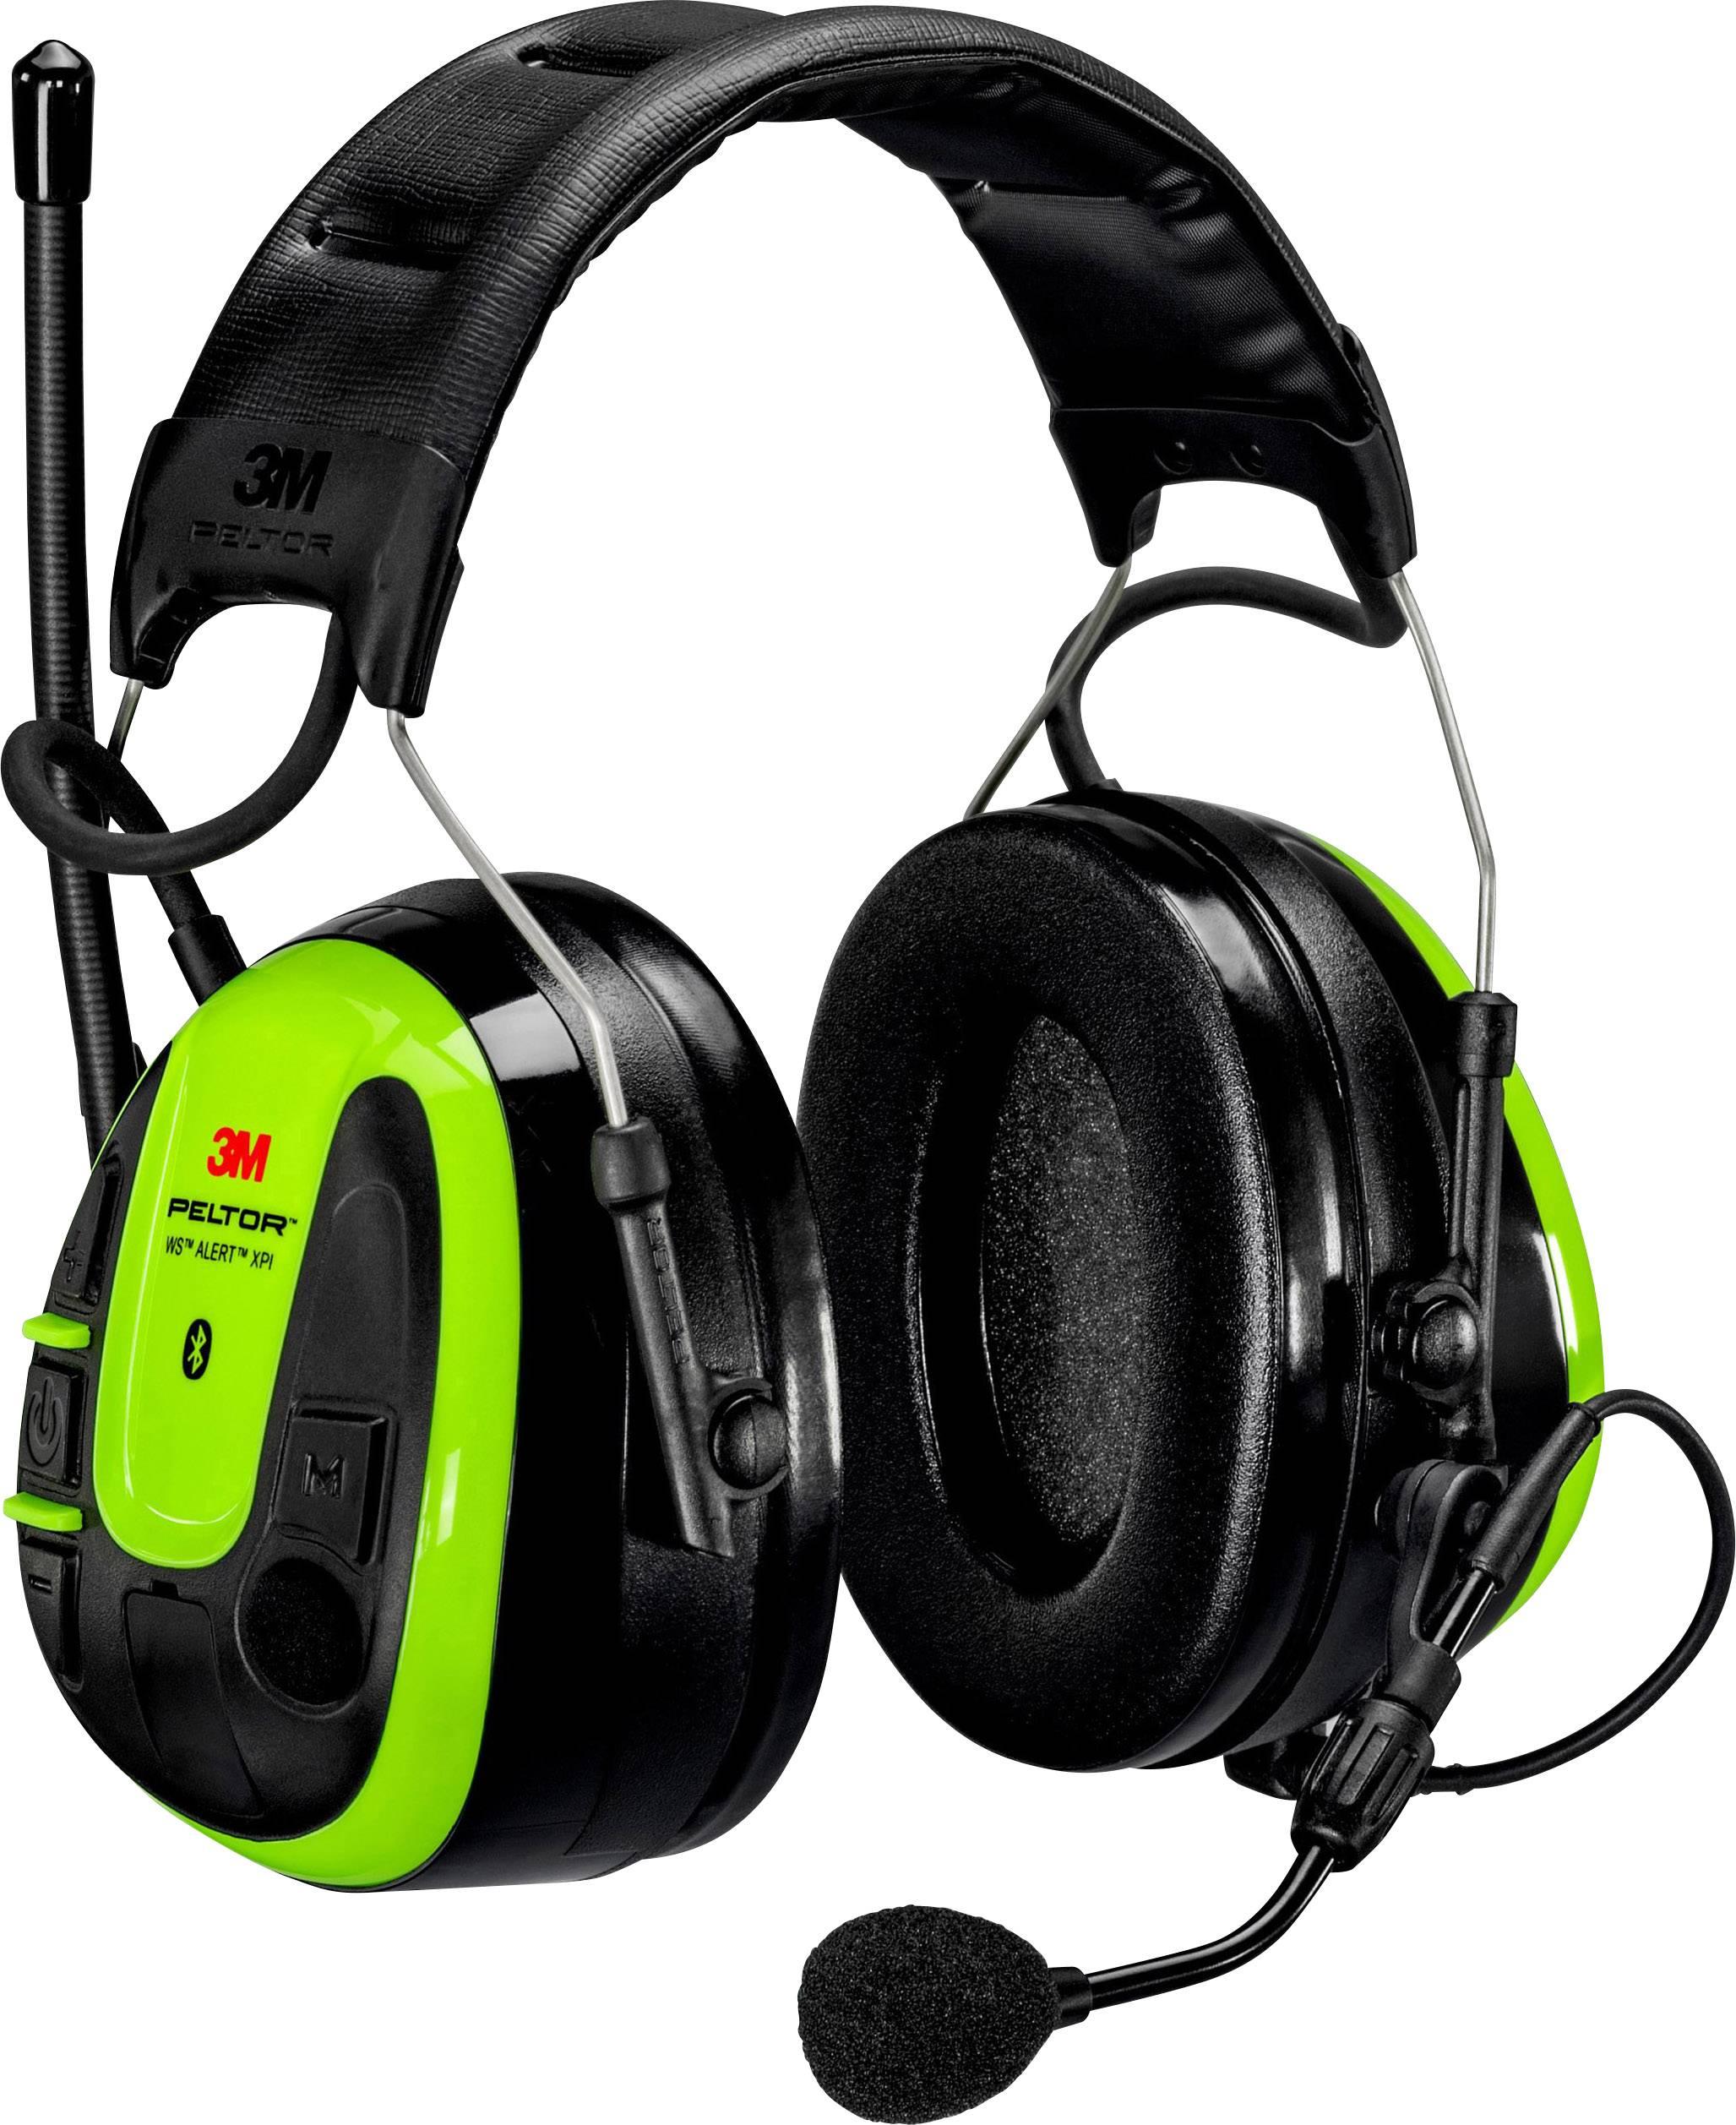 3M Peltor WS ALERT XPI MRX21AWS6 Protective ear caps headset 30 dB 1 pc(s)   Conrad.com